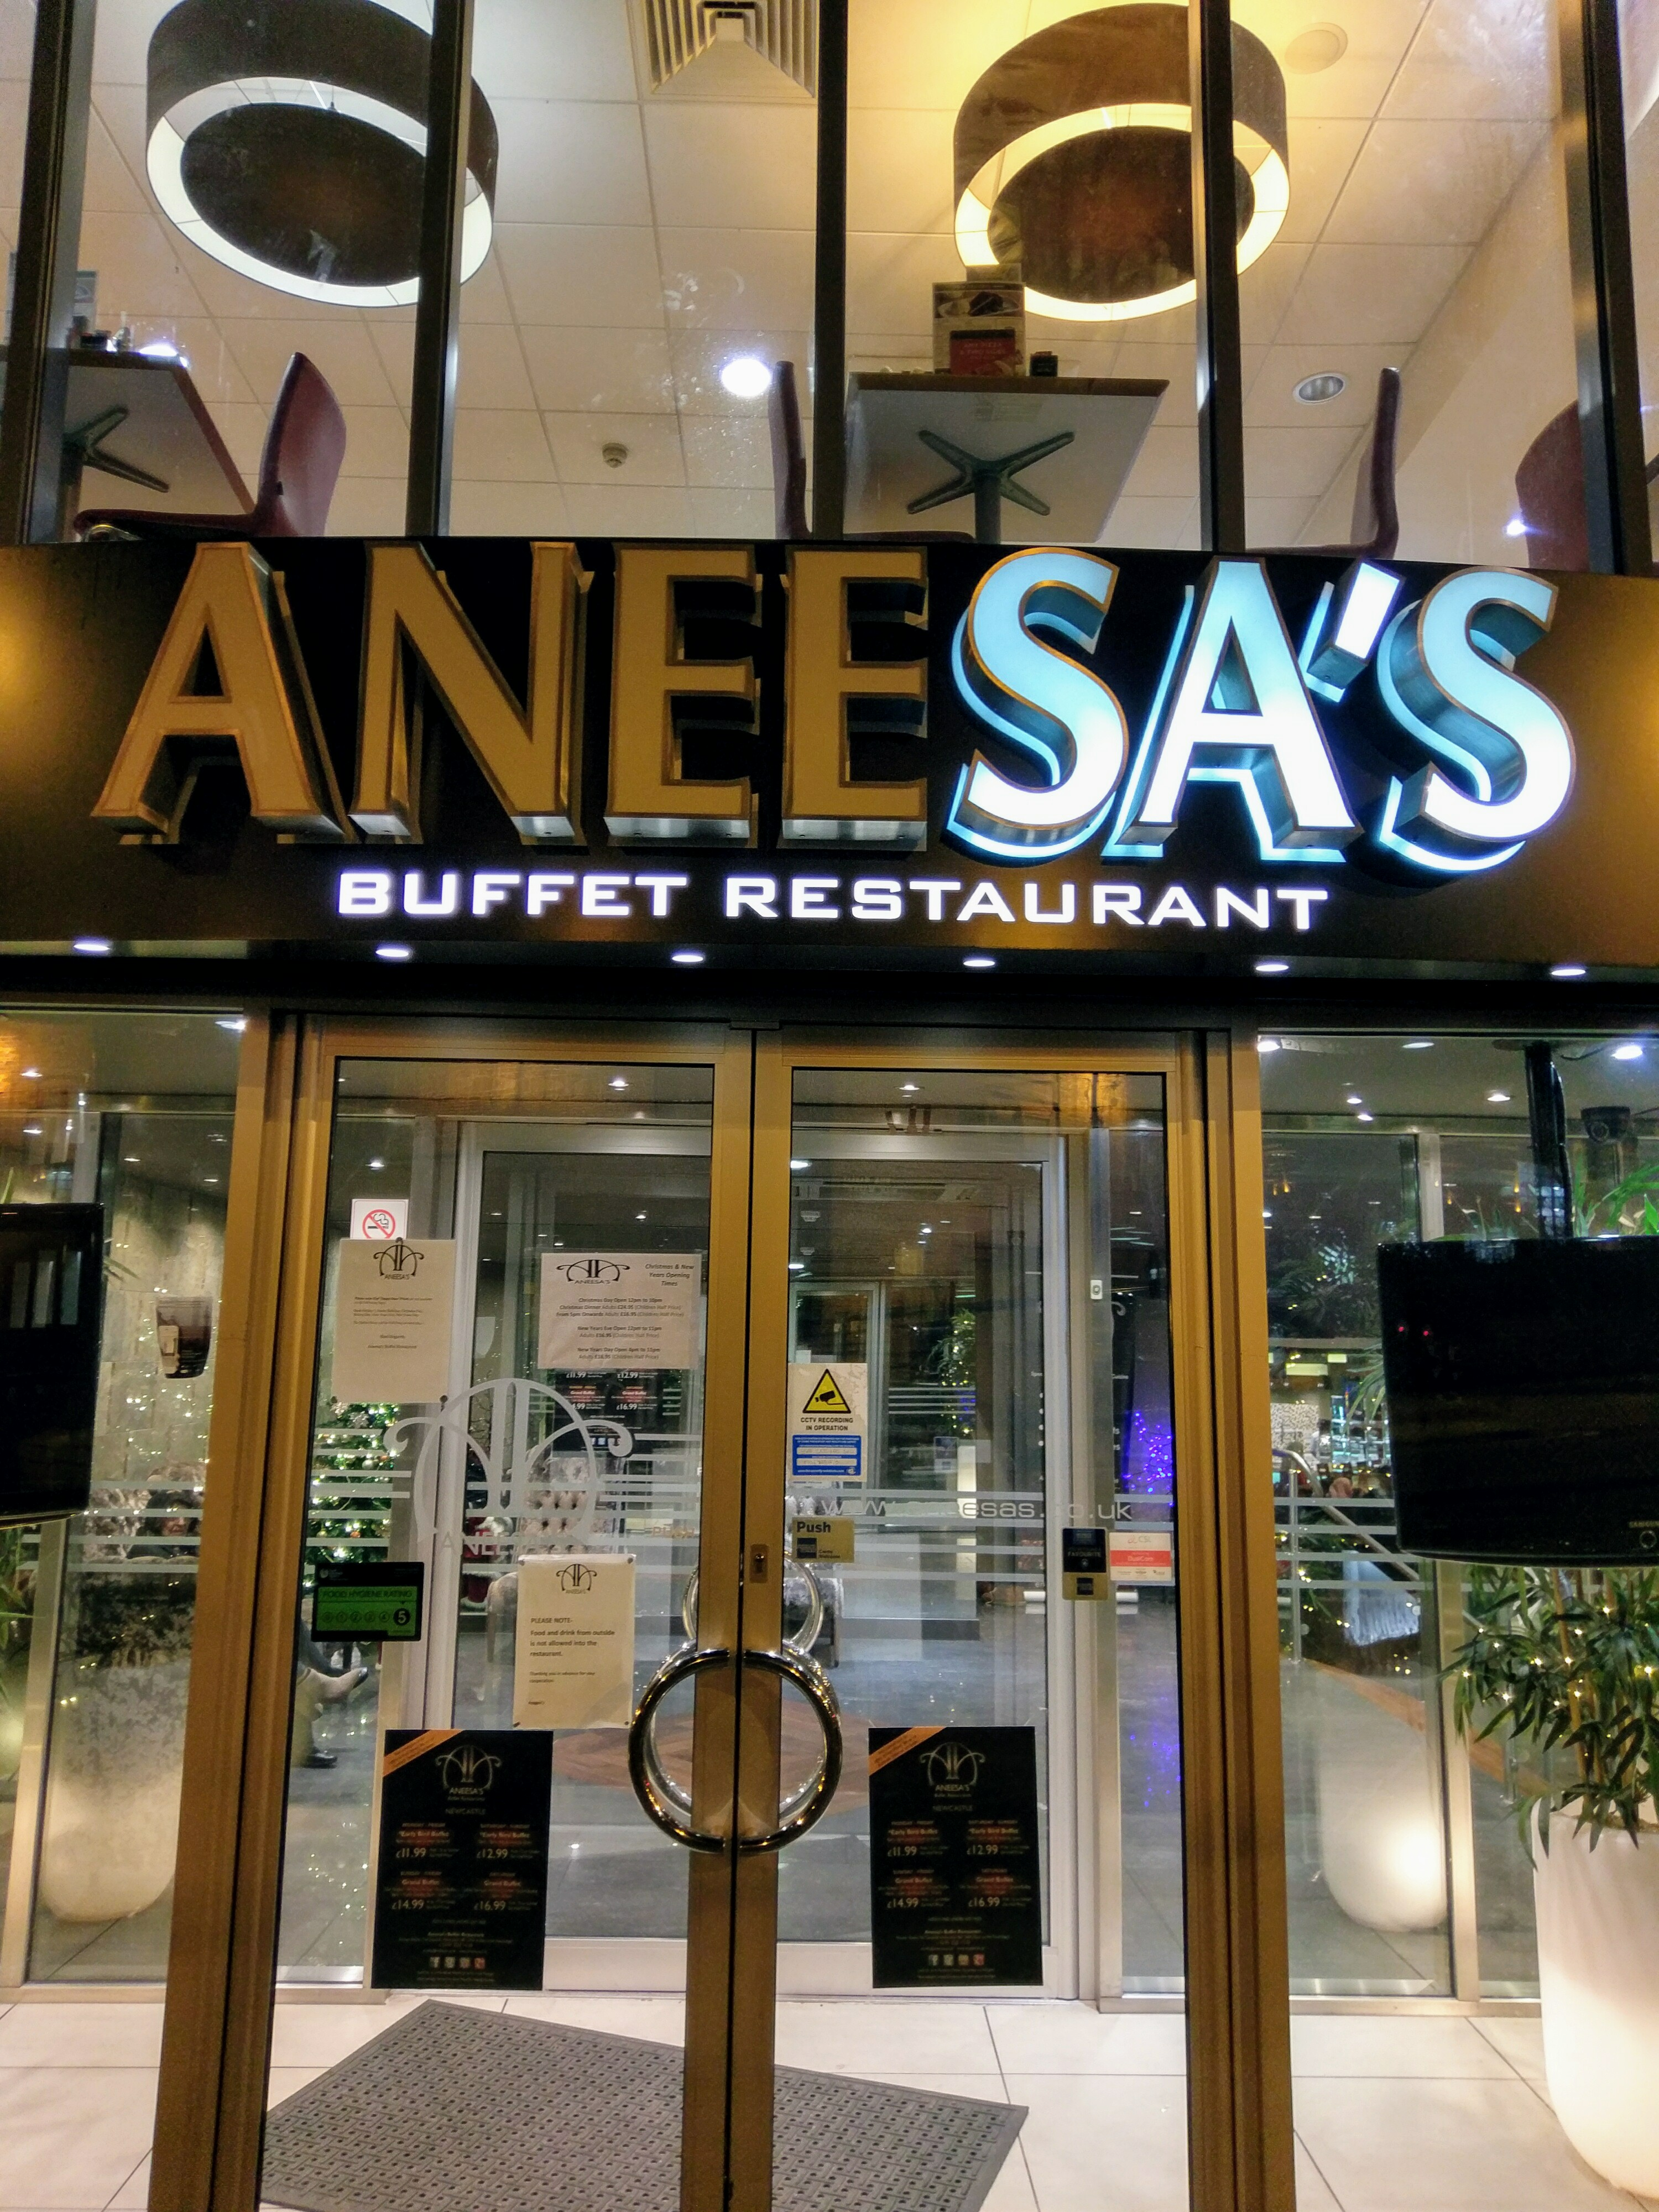 Aneesa's Buffet Restaurant, Newcastle upon Tyne, UK